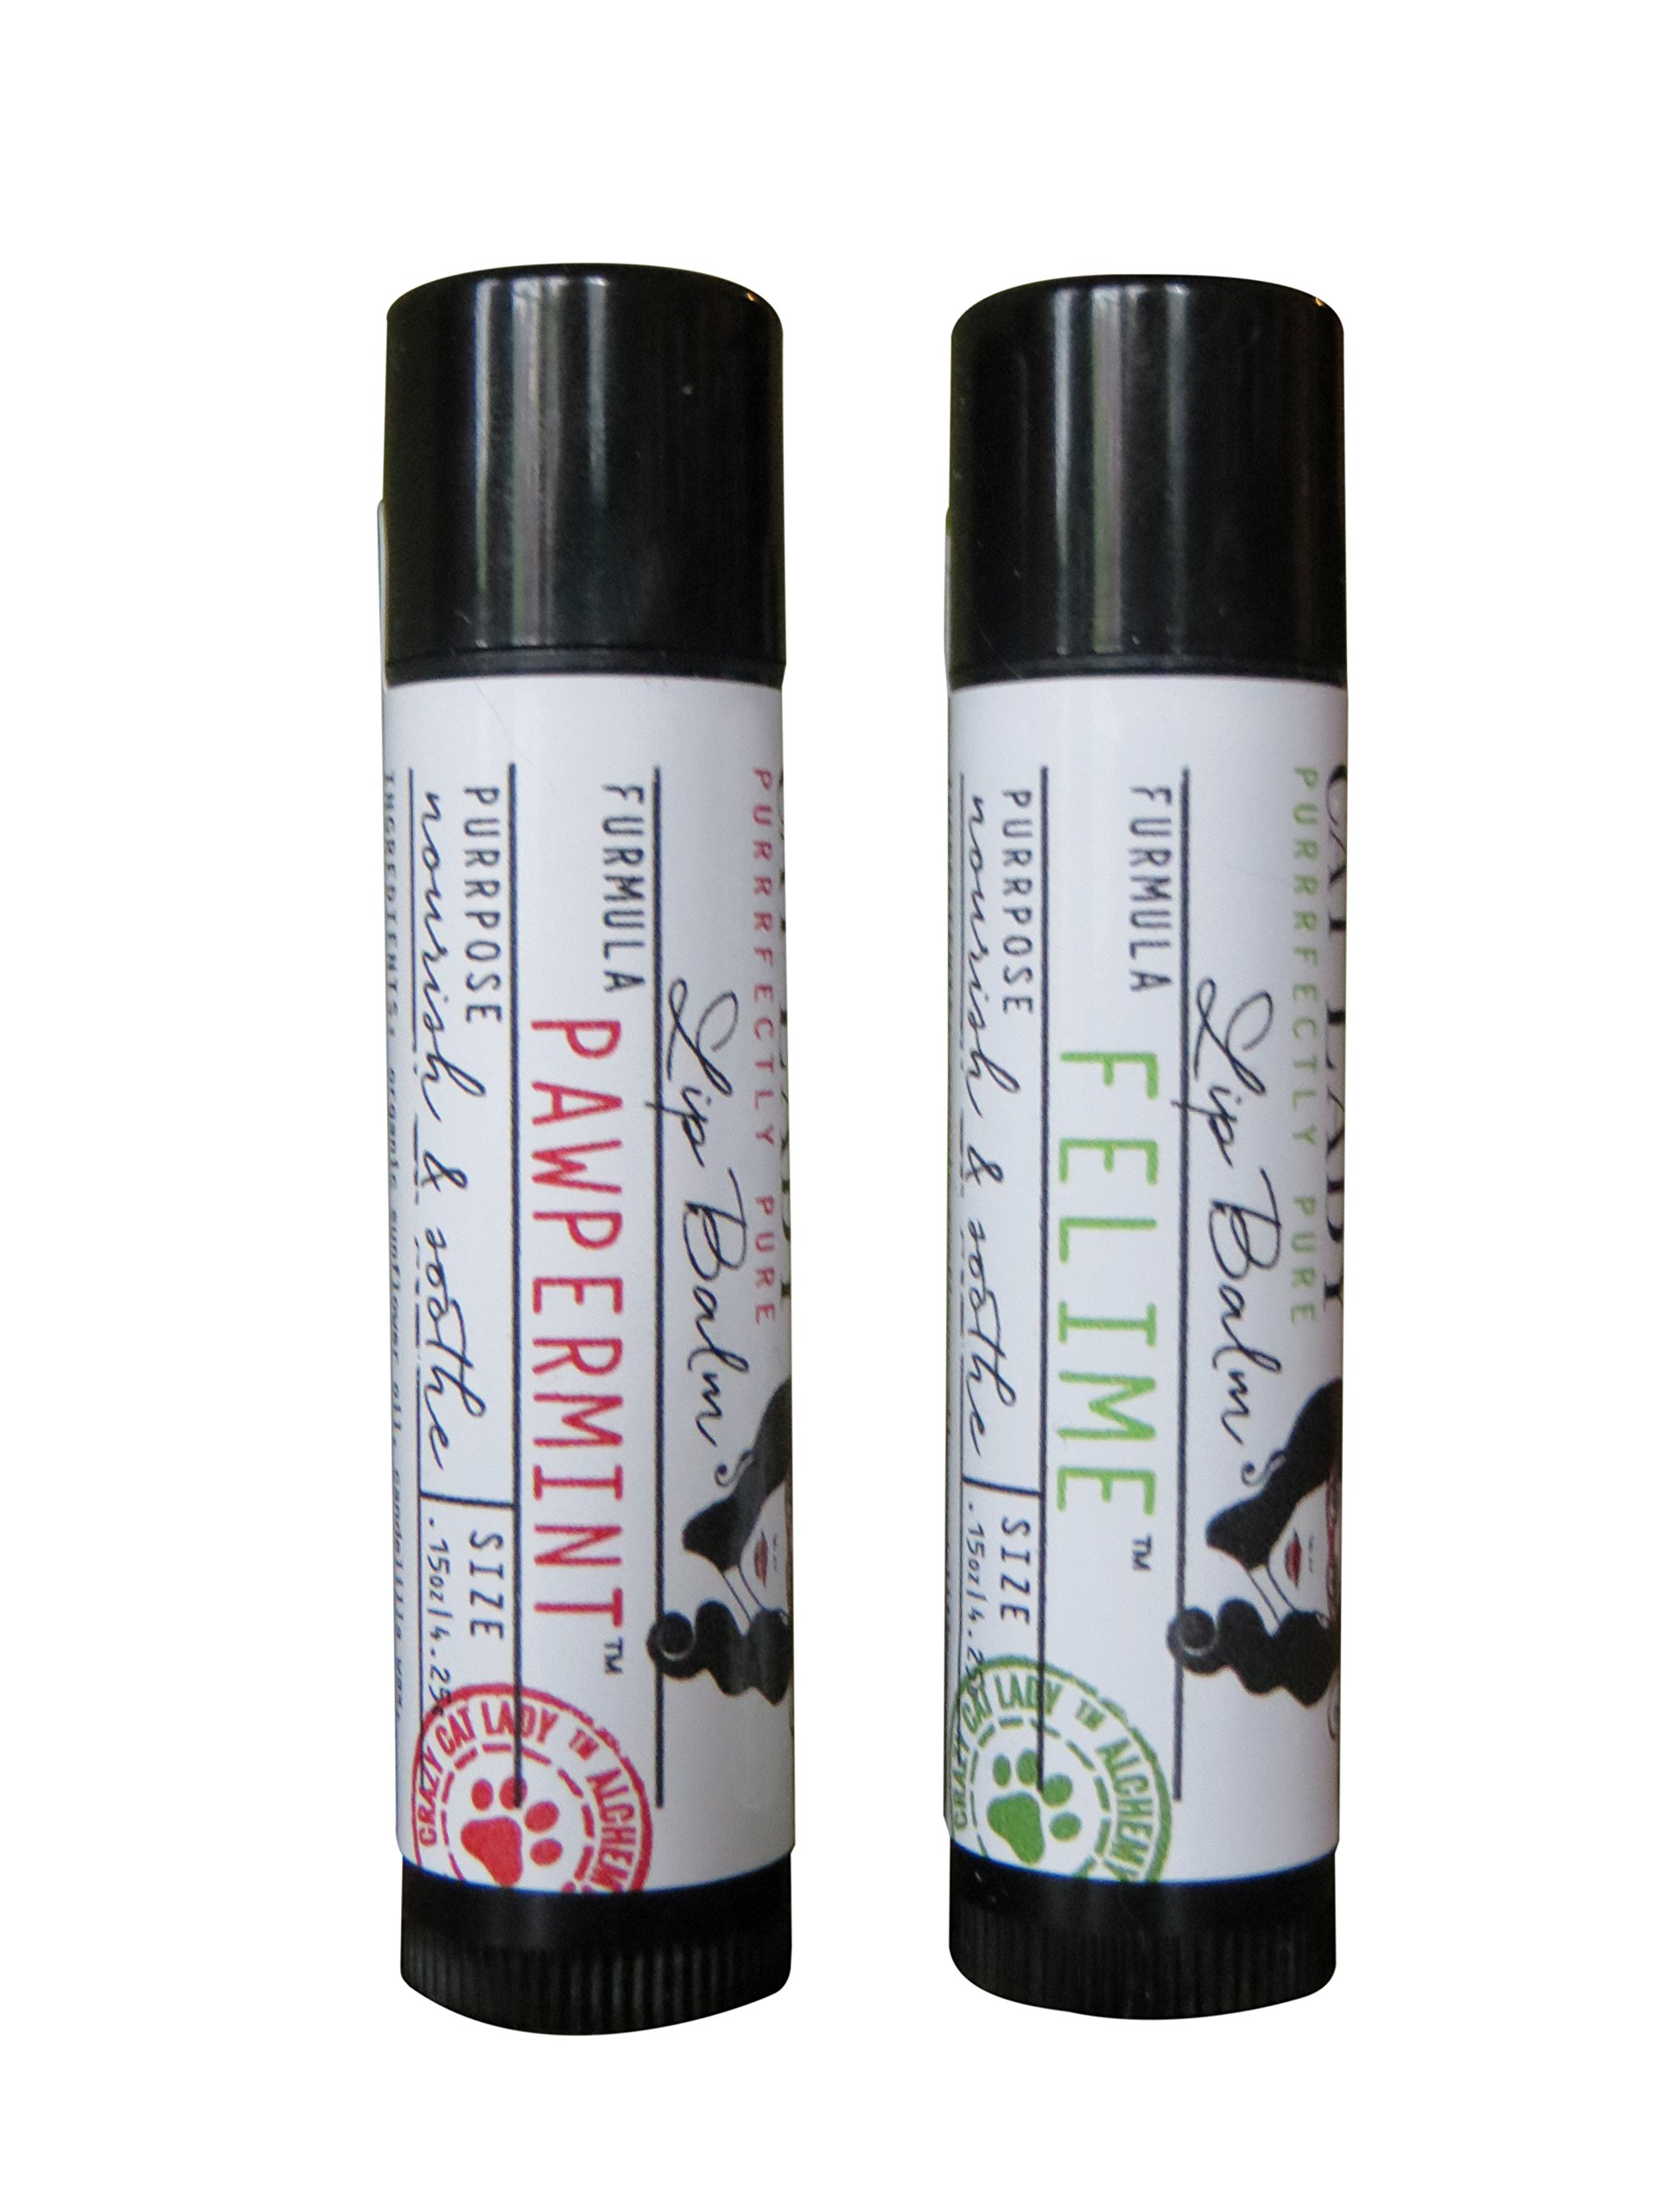 Crazy Cat Lady Vegan Lip Balm Set - Pawpermint and Felime Flavors